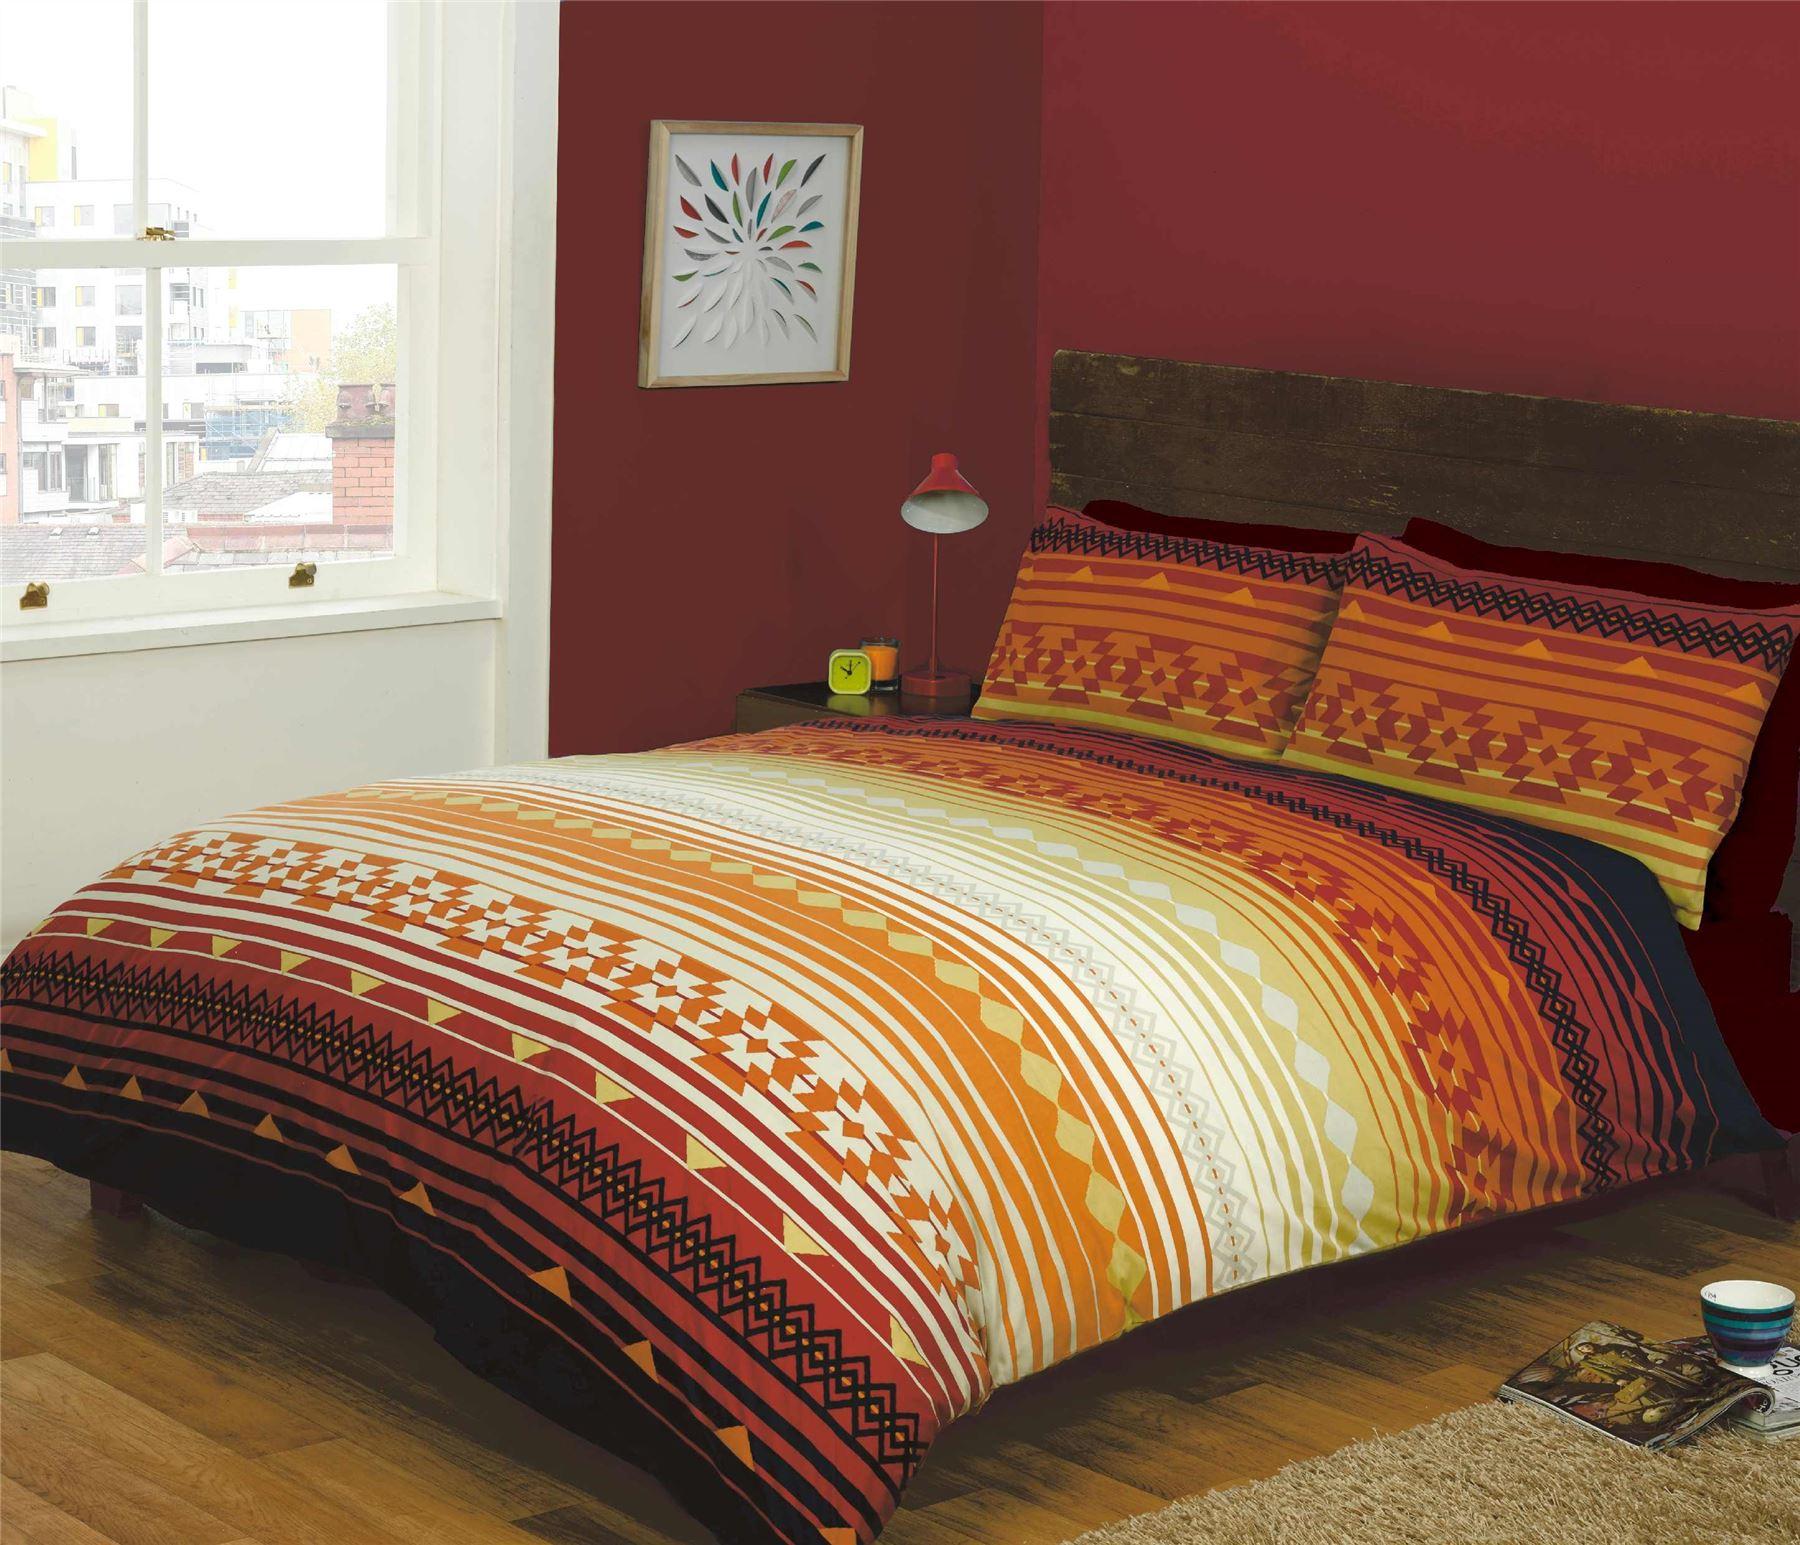 indian inspired quilt duvet cover pillowcase bedding bed sets 3 sizes ebay. Black Bedroom Furniture Sets. Home Design Ideas